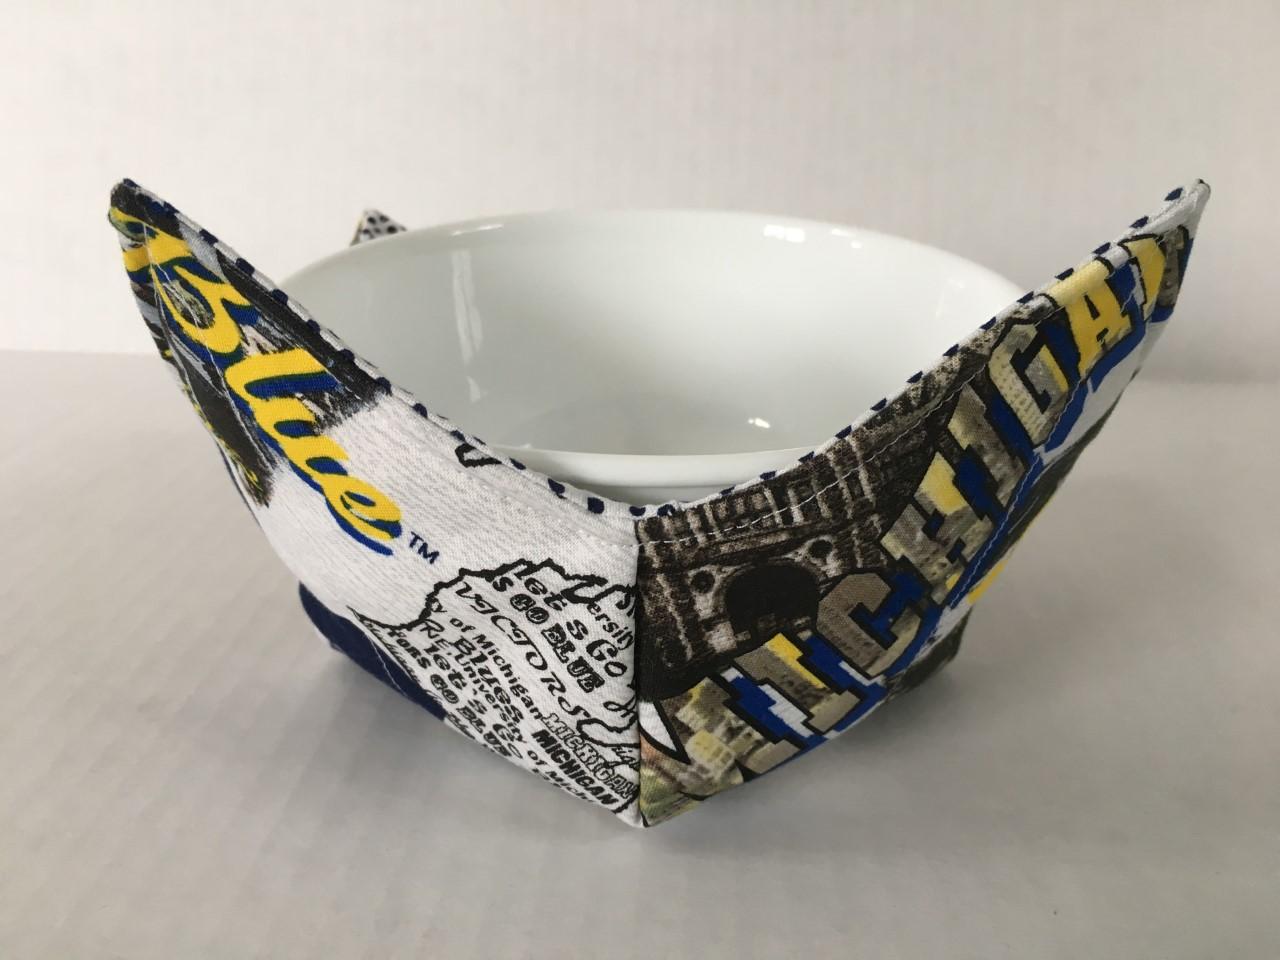 Bowl Holder Soup Bowl Cozy Microwavable Bowl Cozie Set Reversible Kitchen Accessory Bowl Cozy Set Mother/'s Day \u2013 Watercolor Banana